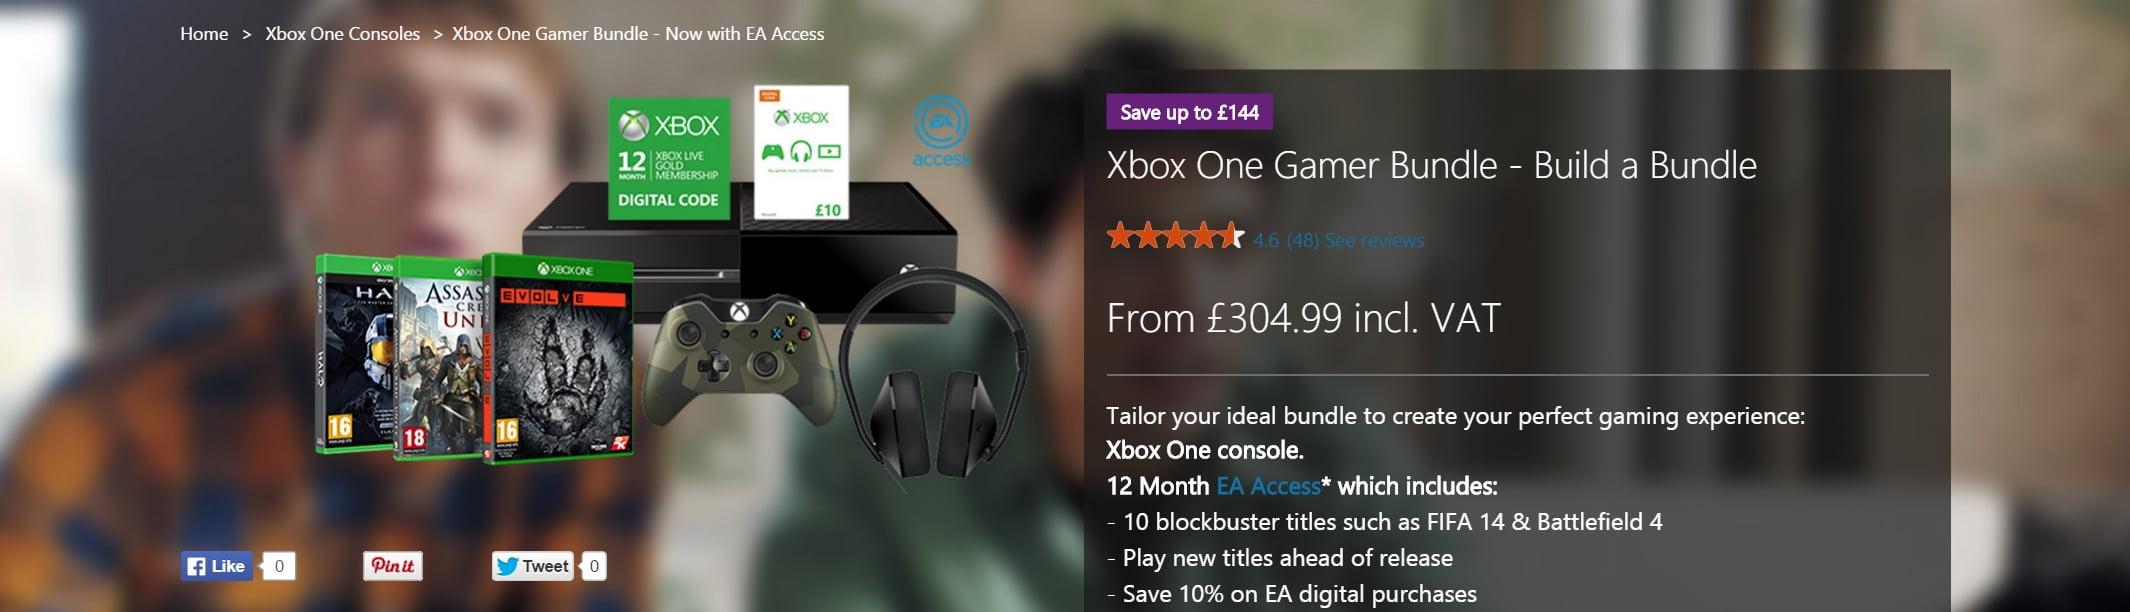 Xbox One Gamer Bundle